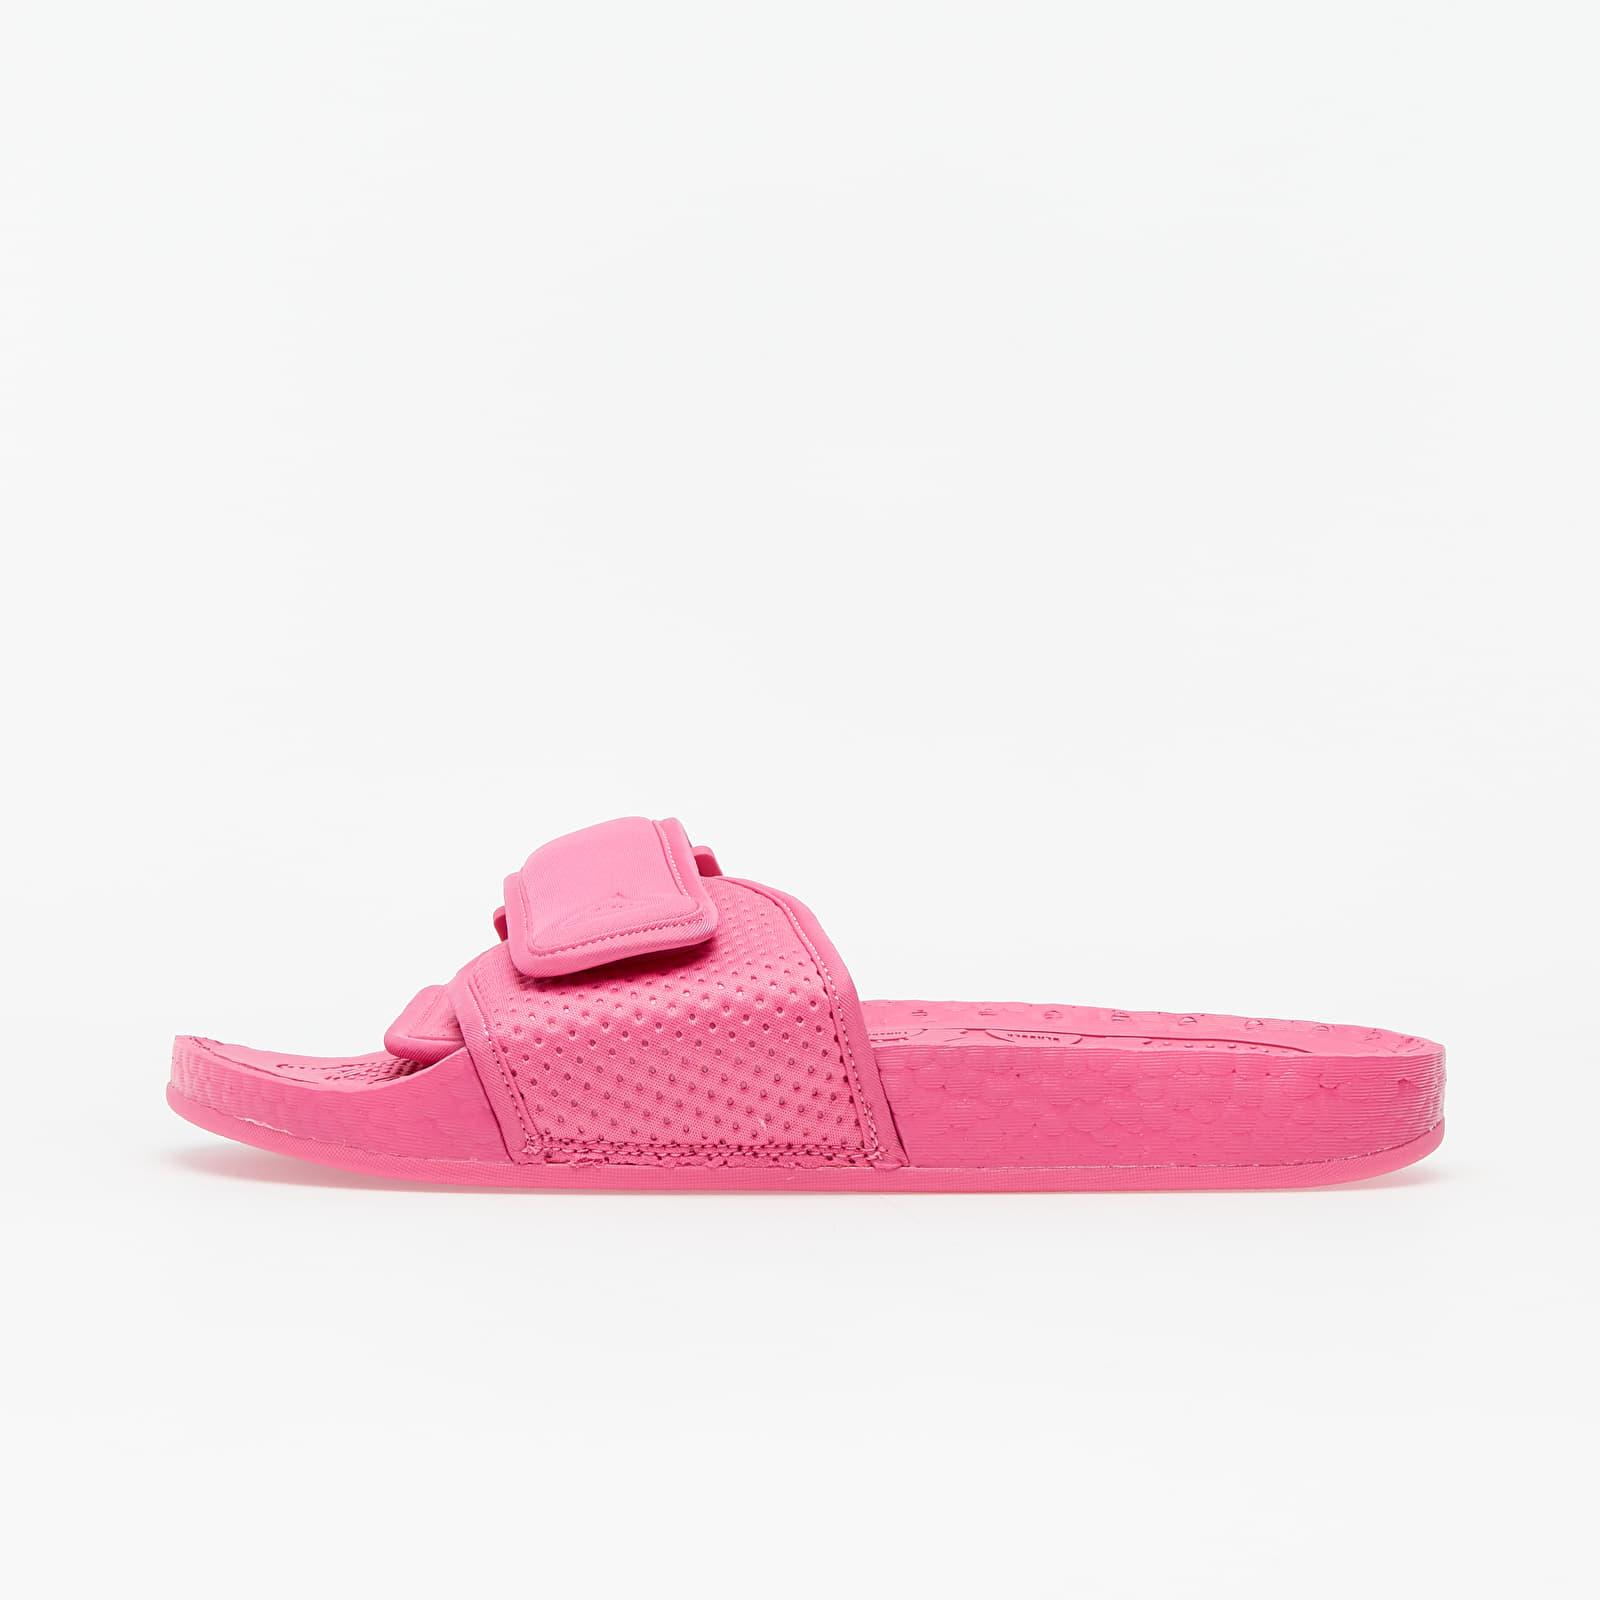 adidas x Pharrell Williams Chancletas HU Semi Solar Pink/ Semi Solar Pink/ Semi Solar Pink FV7289